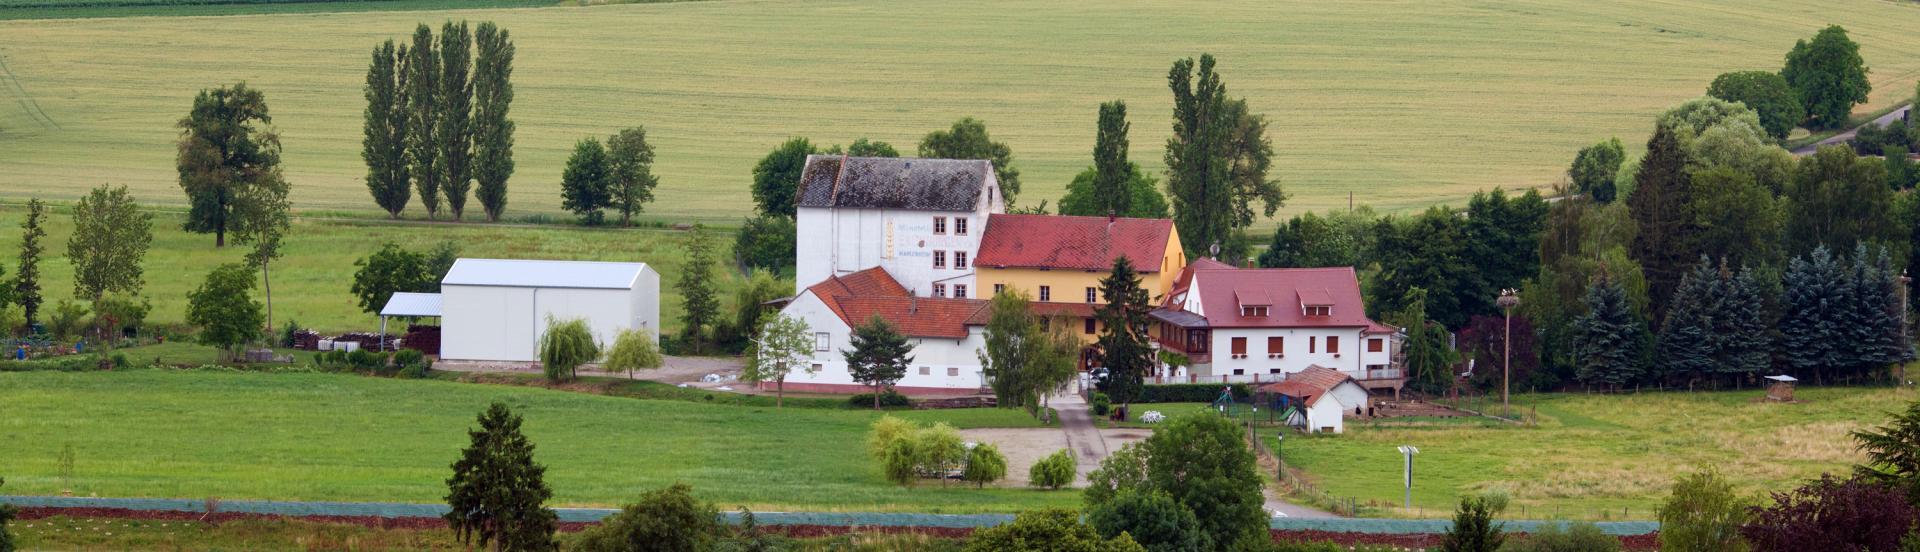 Domaine Xavier Muller à Marlenheim